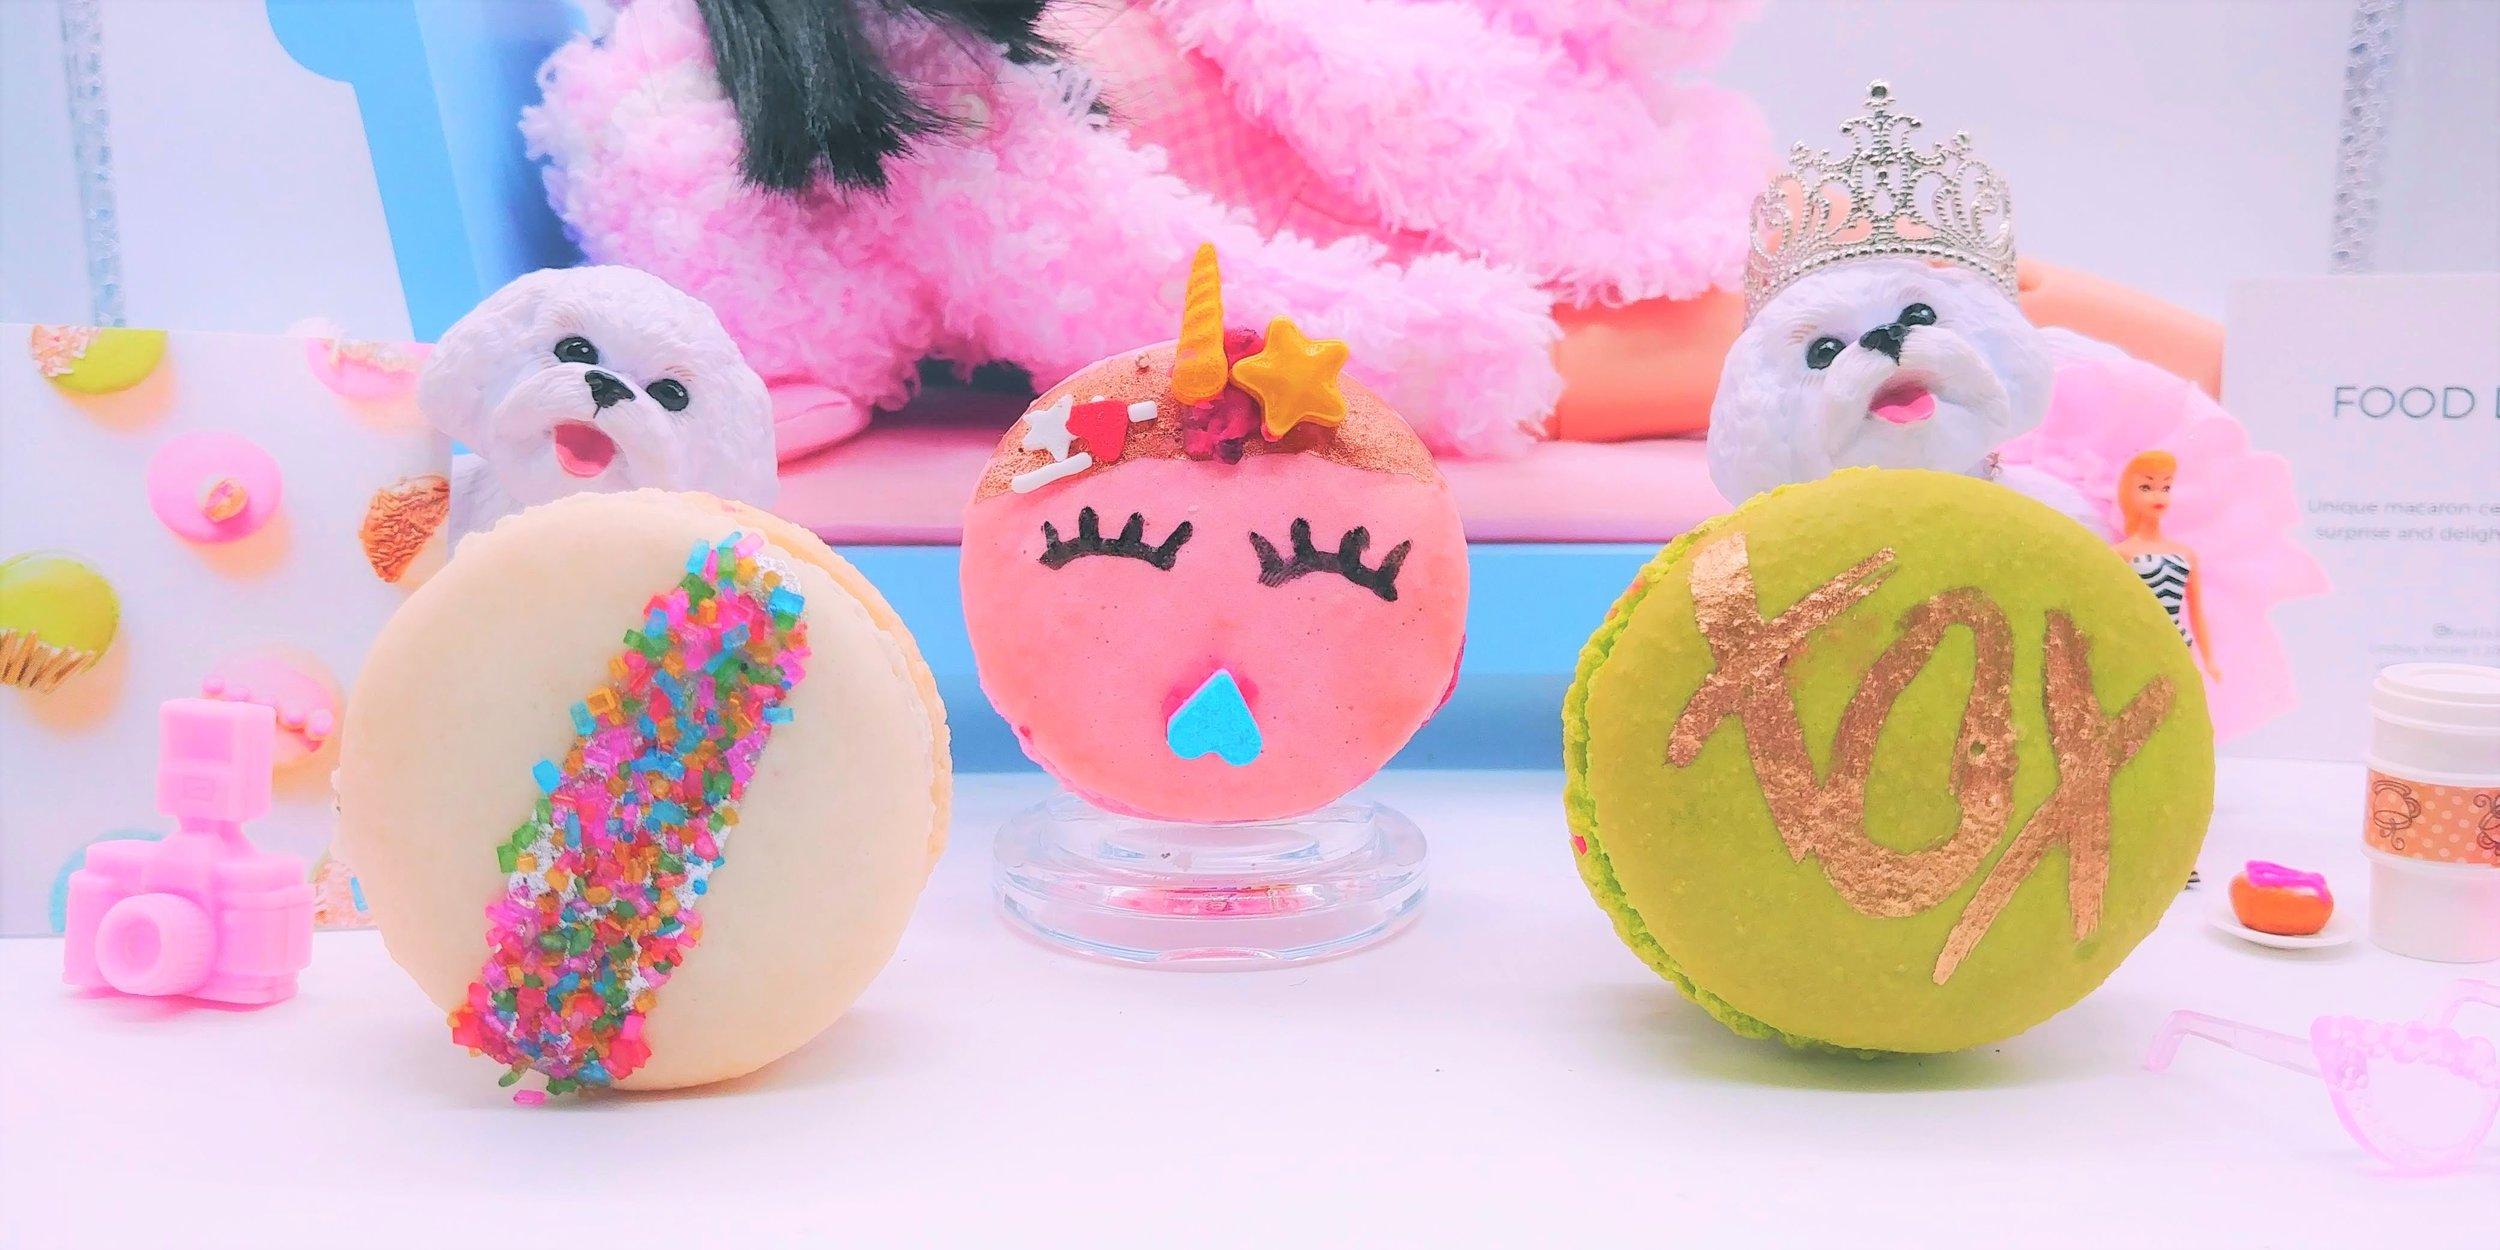 sweetspotsf-sffoodphotography-sandybythebay-foodiebarbie-1-15-4.jpg